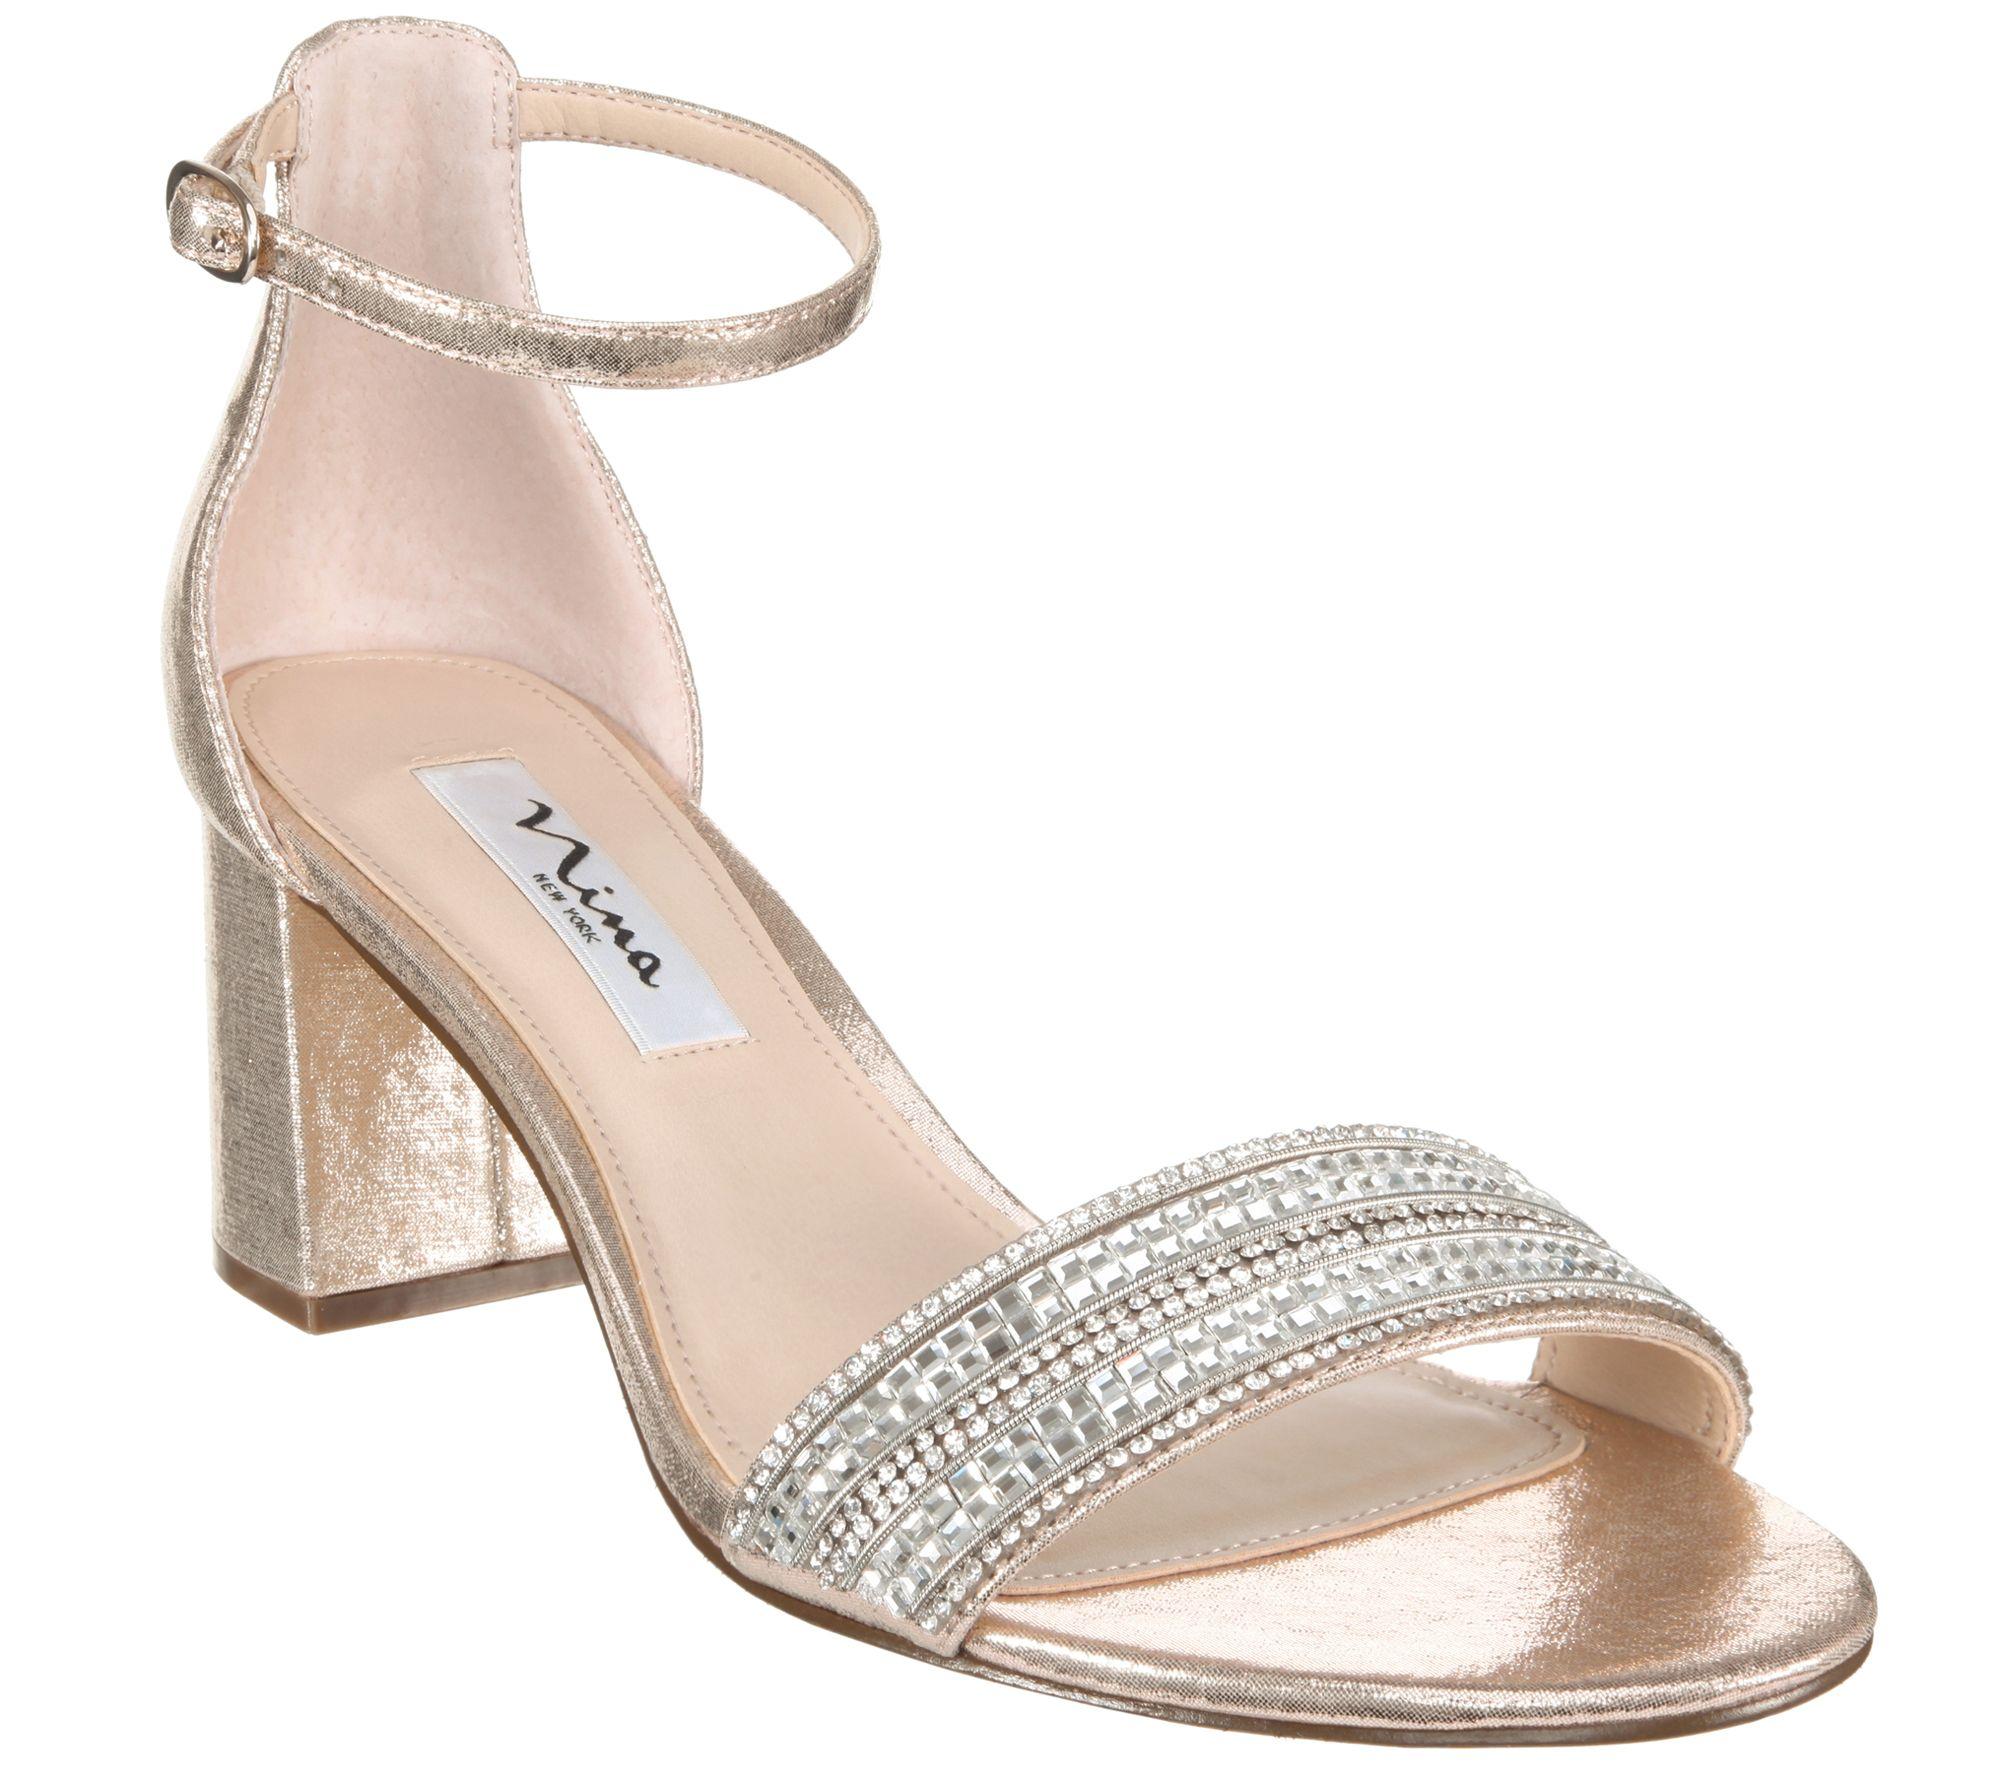 11177b20d223 Nina Block Heel With Crystal Strap Sandals - Elenora — QVC.com